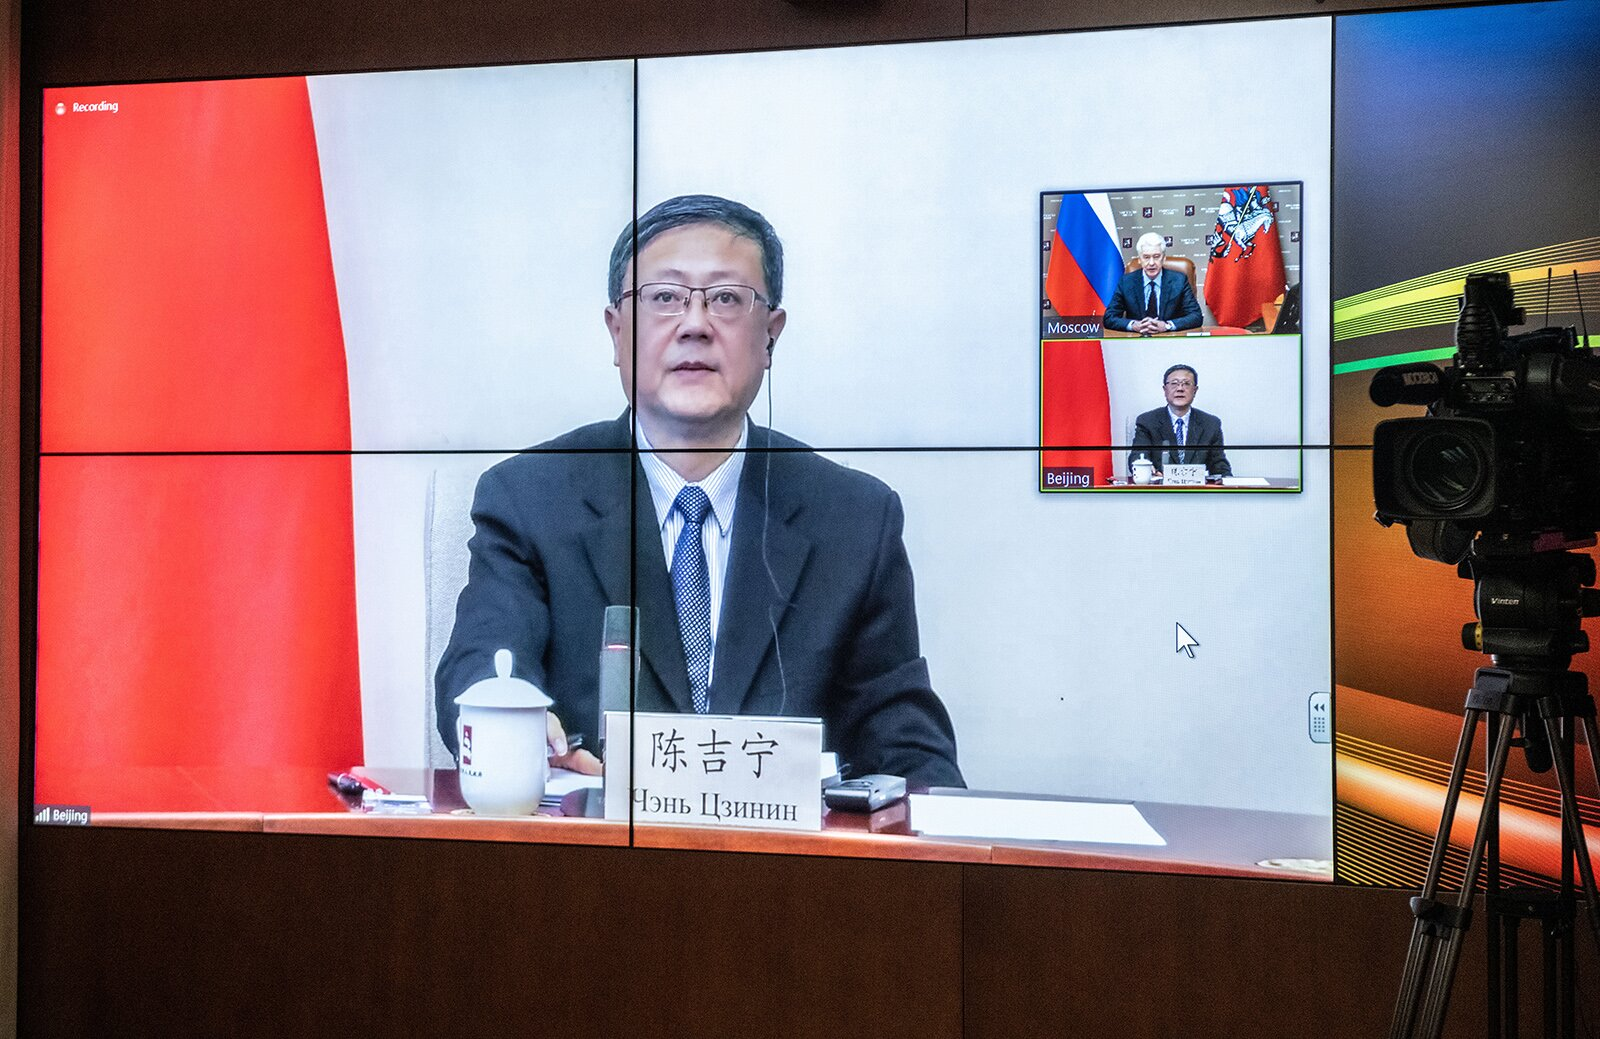 Инновации, транспорт, борьба с COVID-19: Москва и Пекин подписали программу сотрудничества